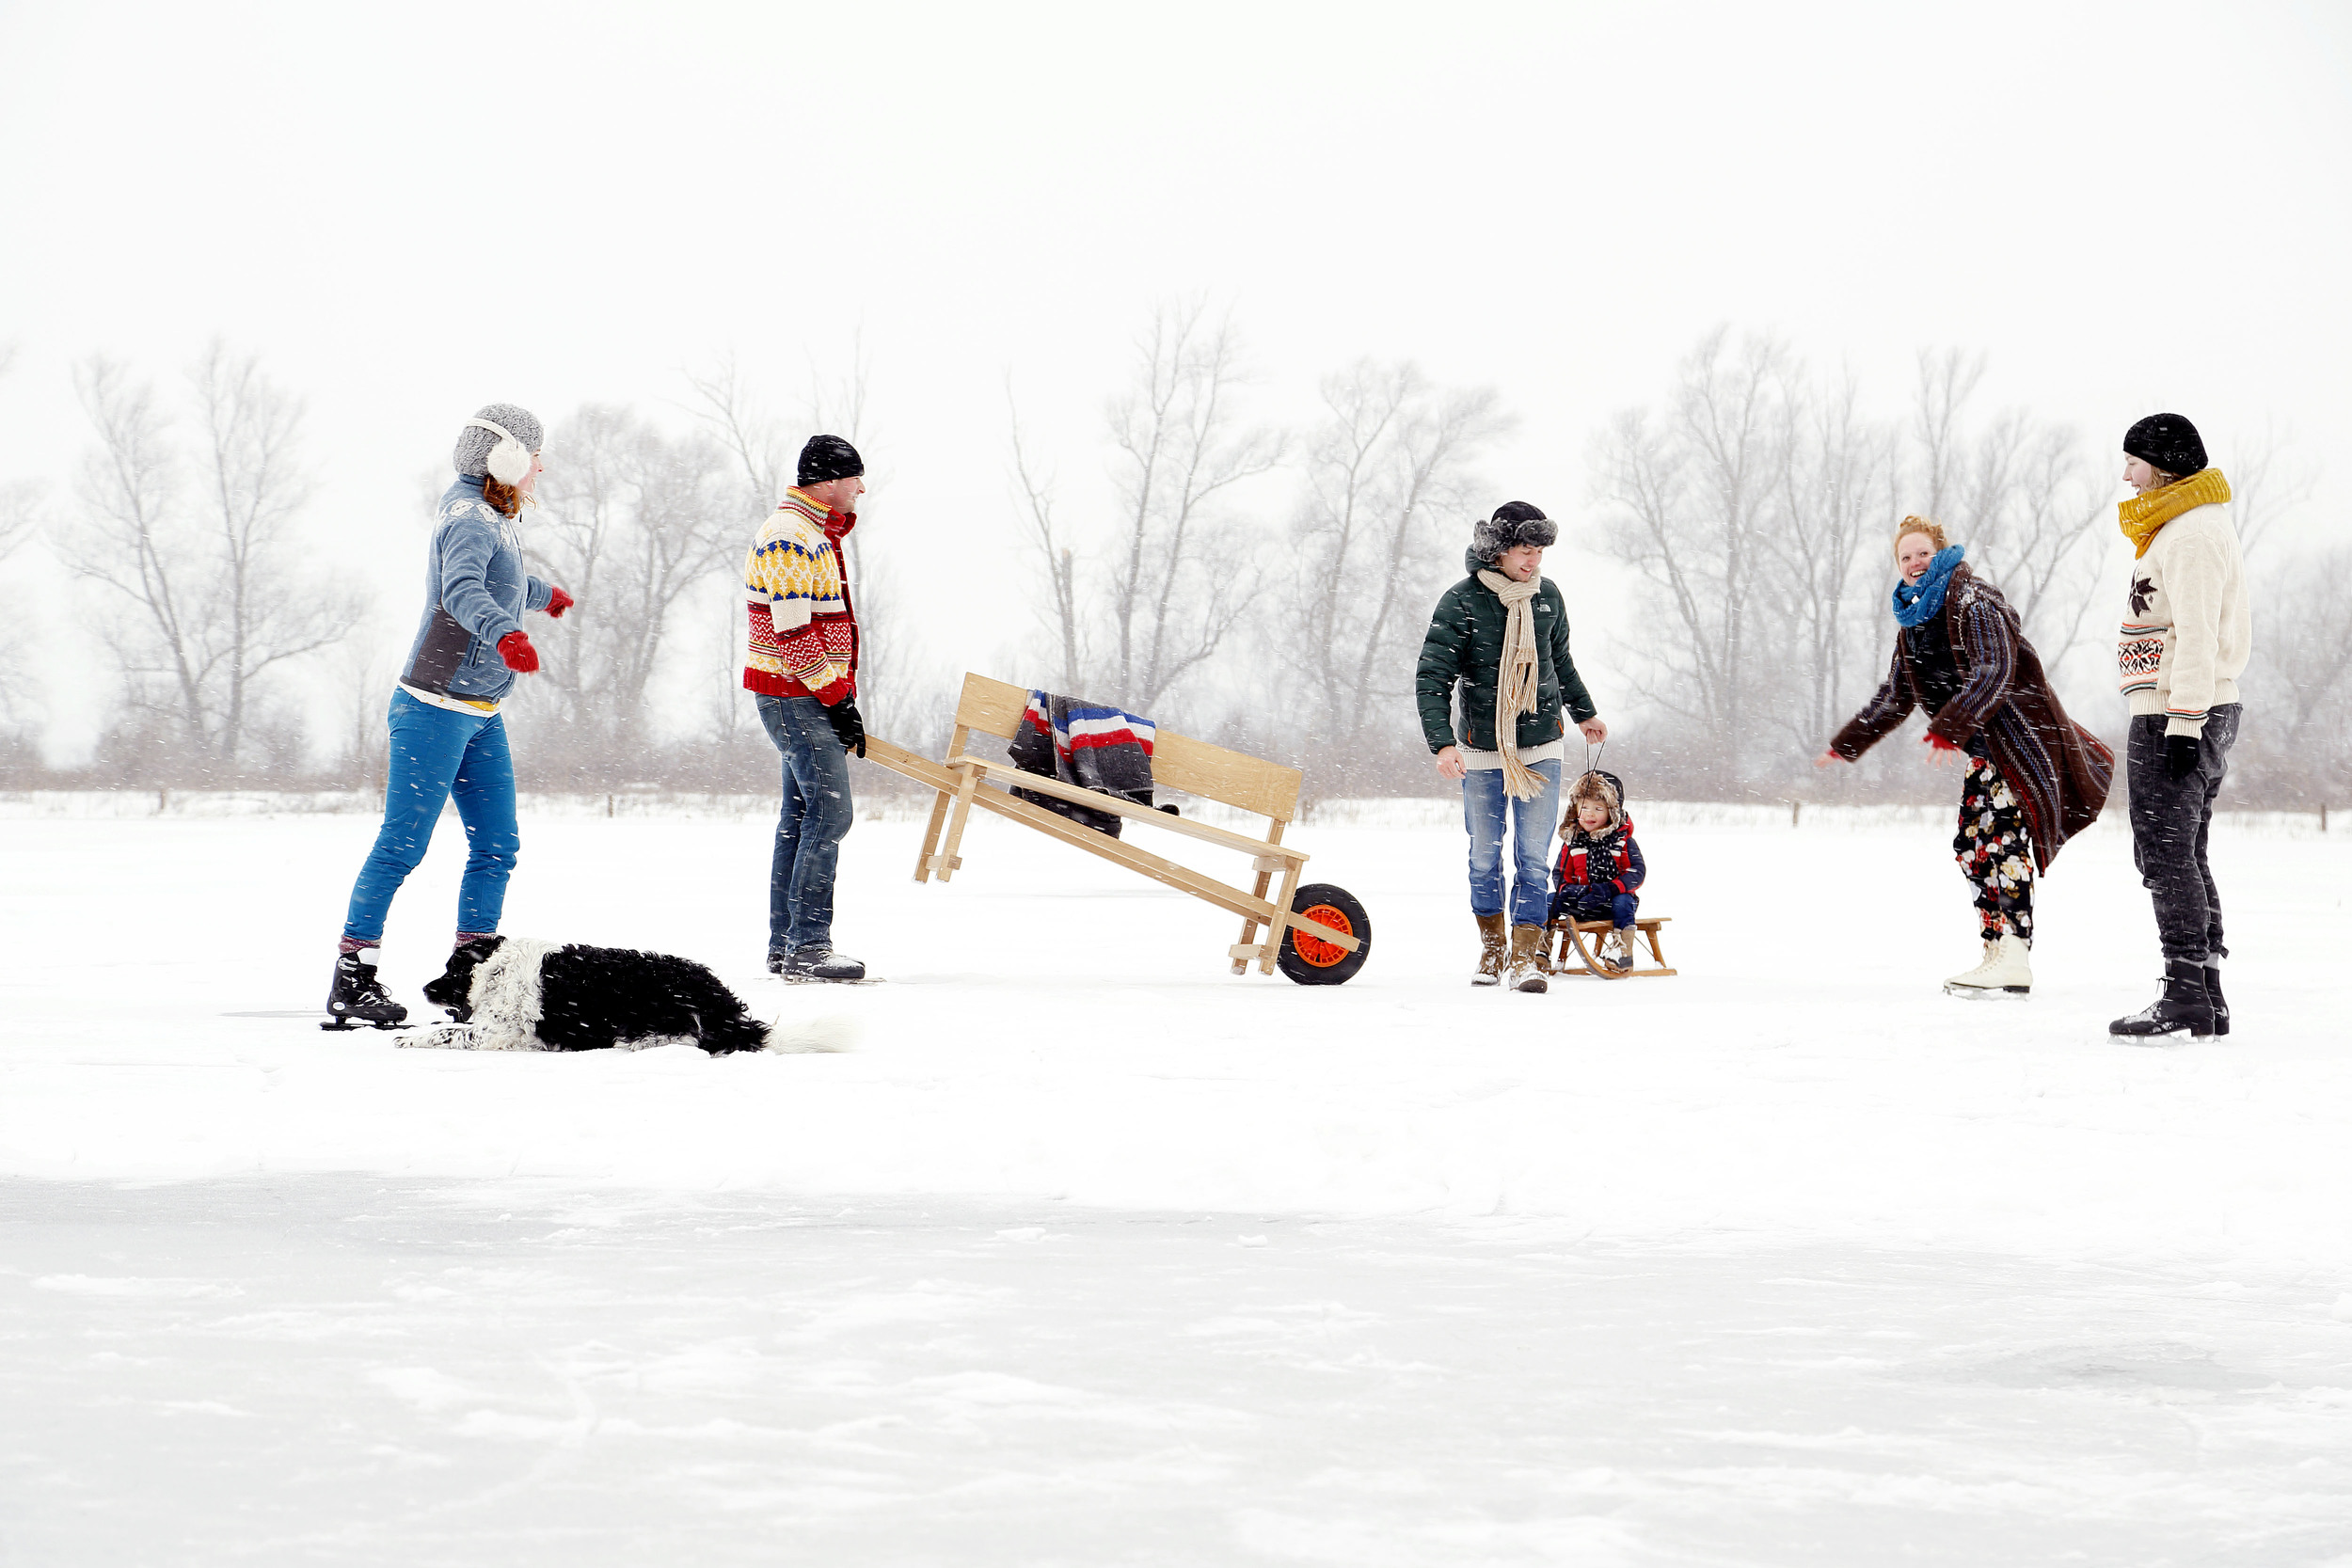 wheelbench-winter-groep-ws.jpg